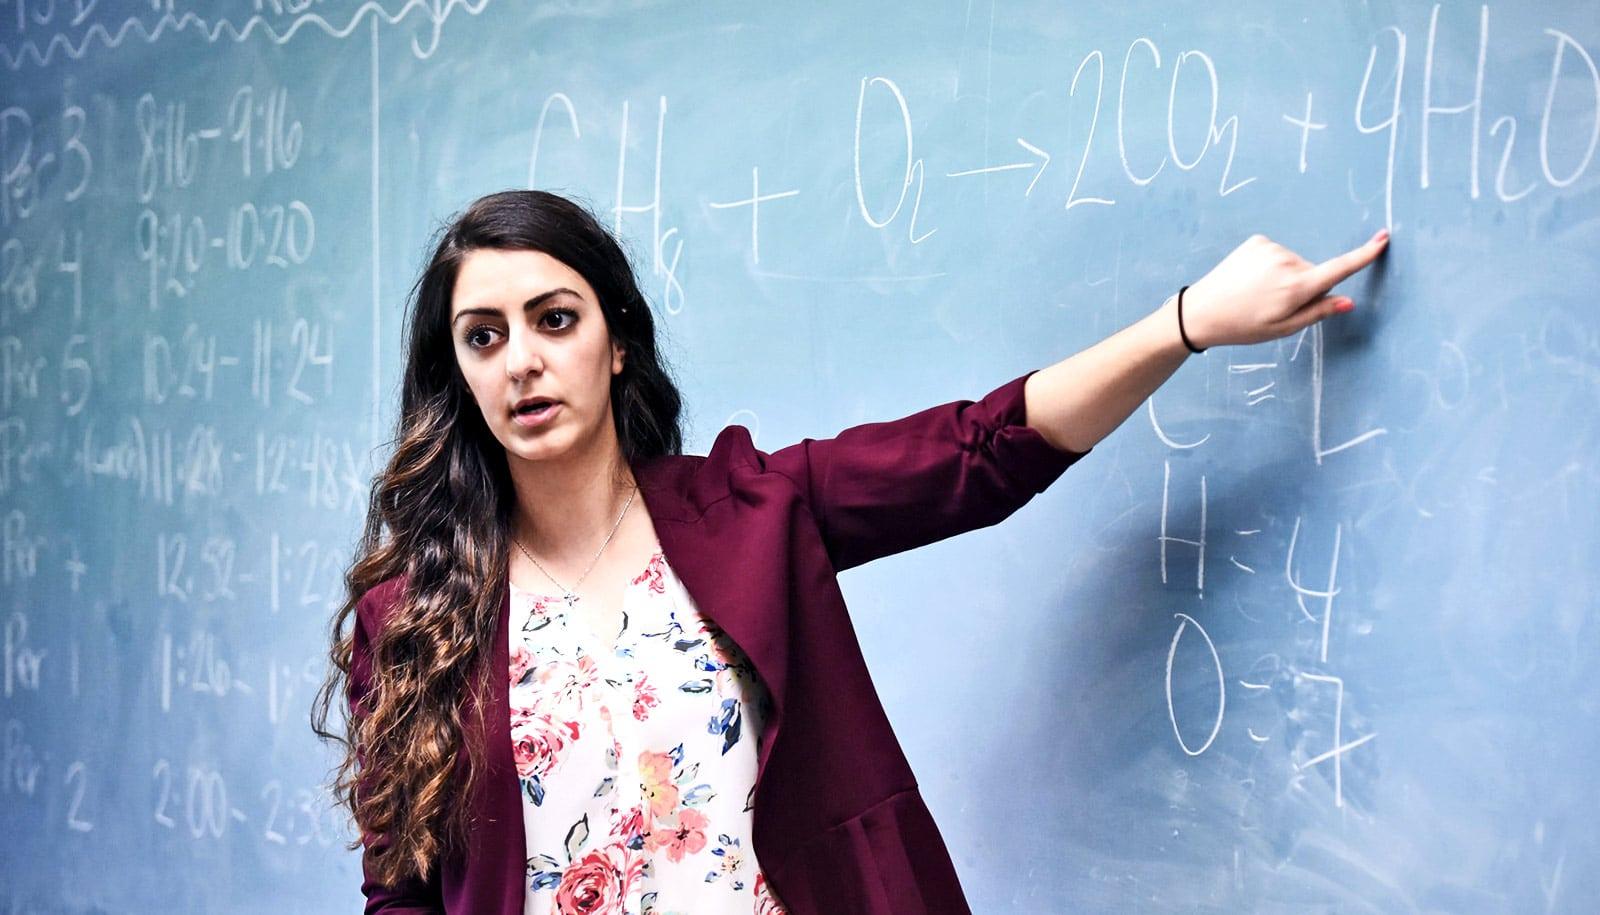 teacher blackboard teachers futurity expert